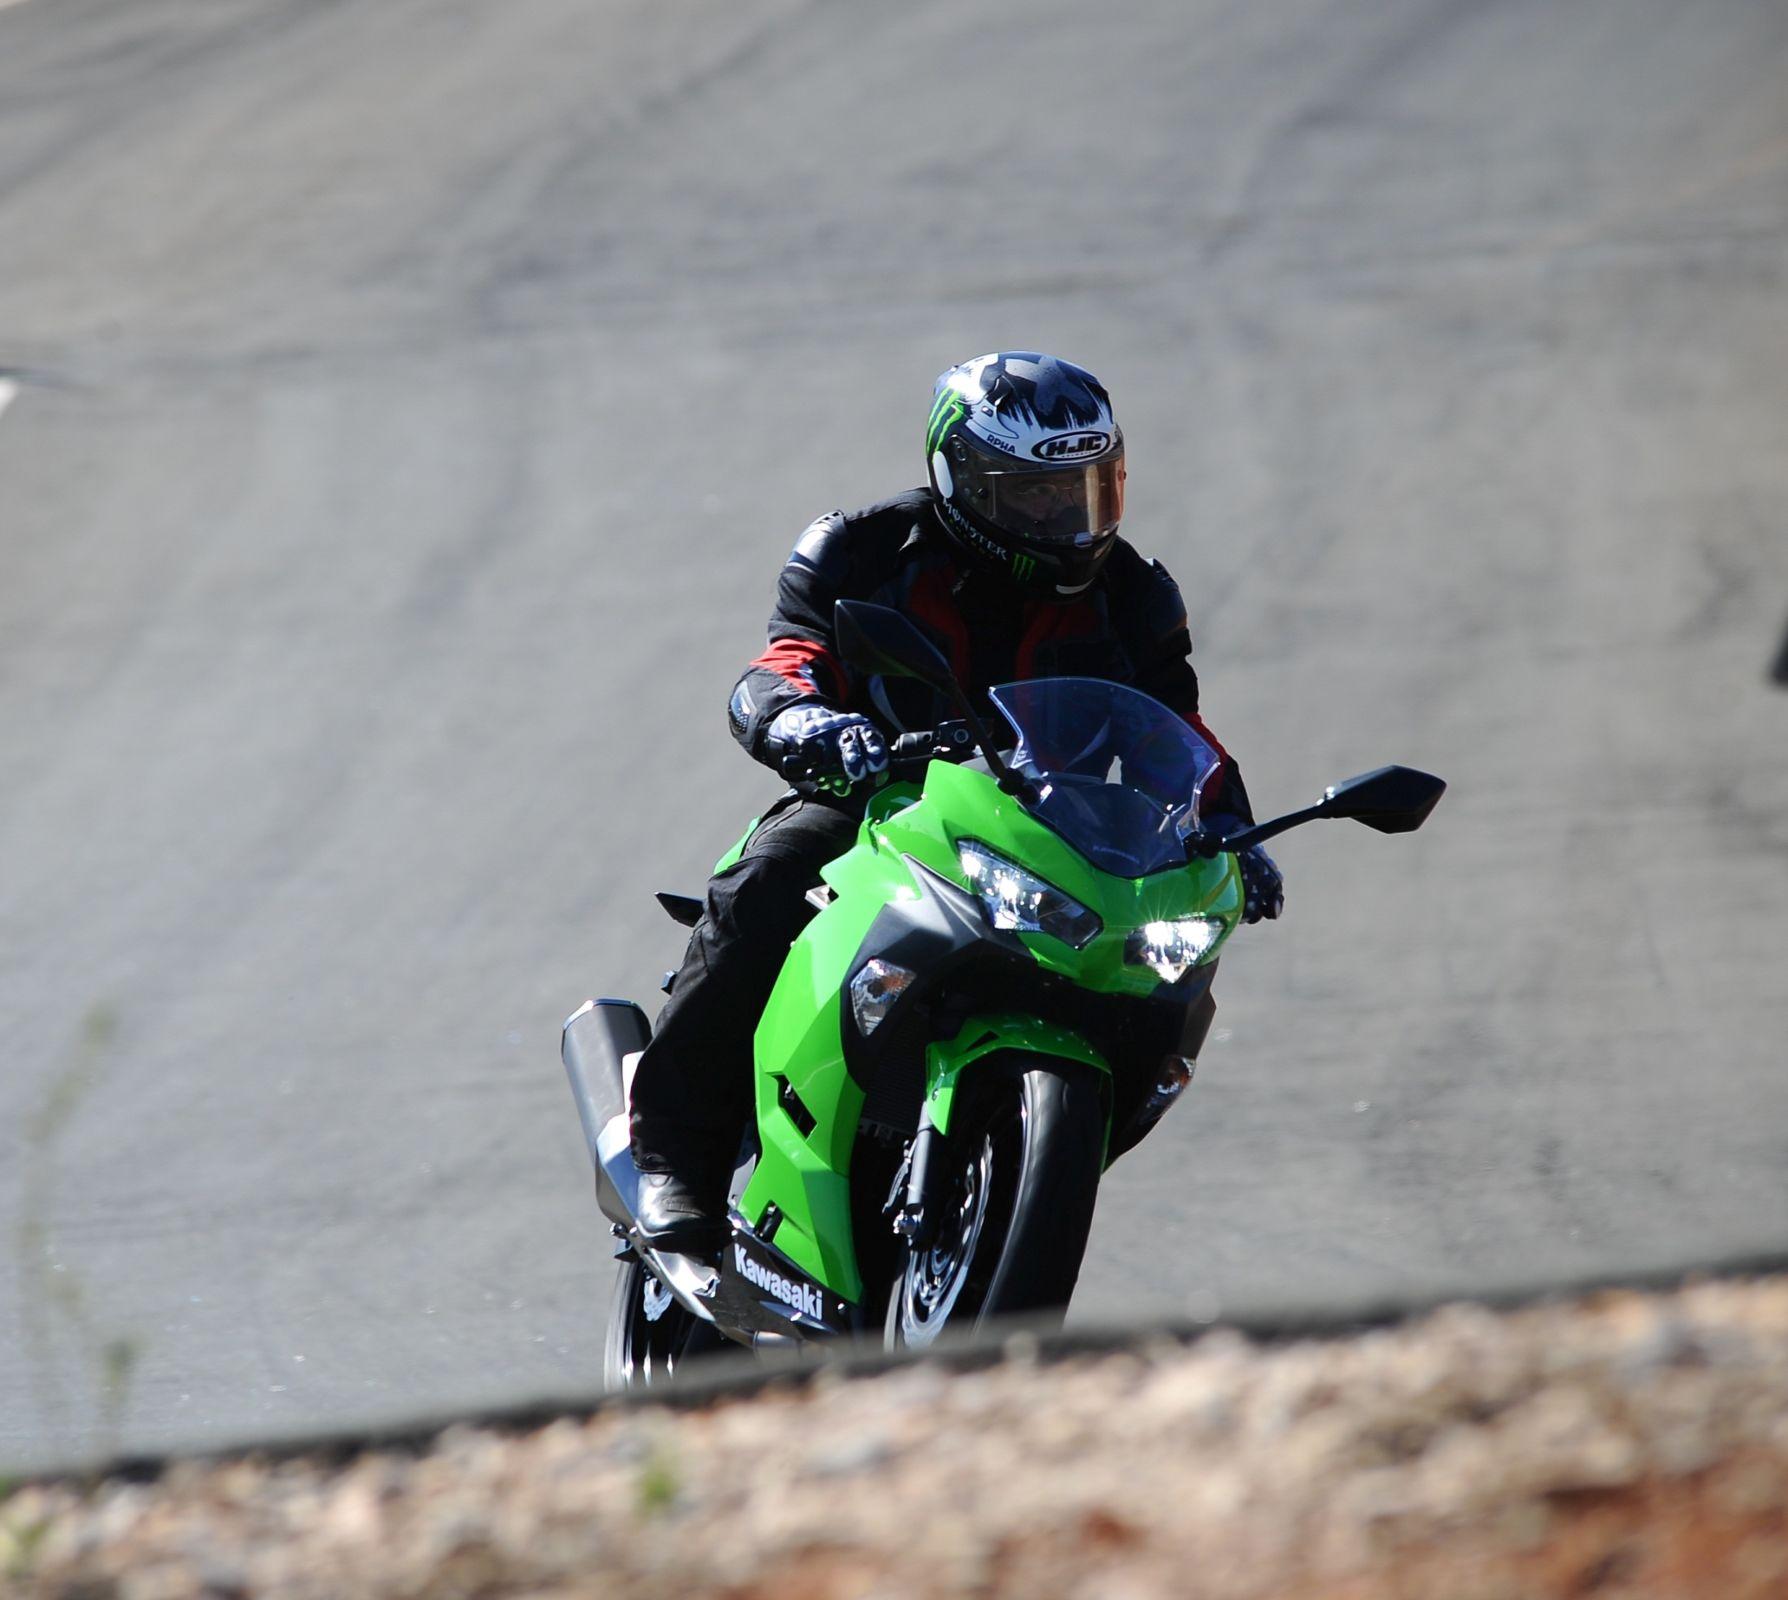 Kawasaki Ninja 400 2019 cresceu e ficou mais leve